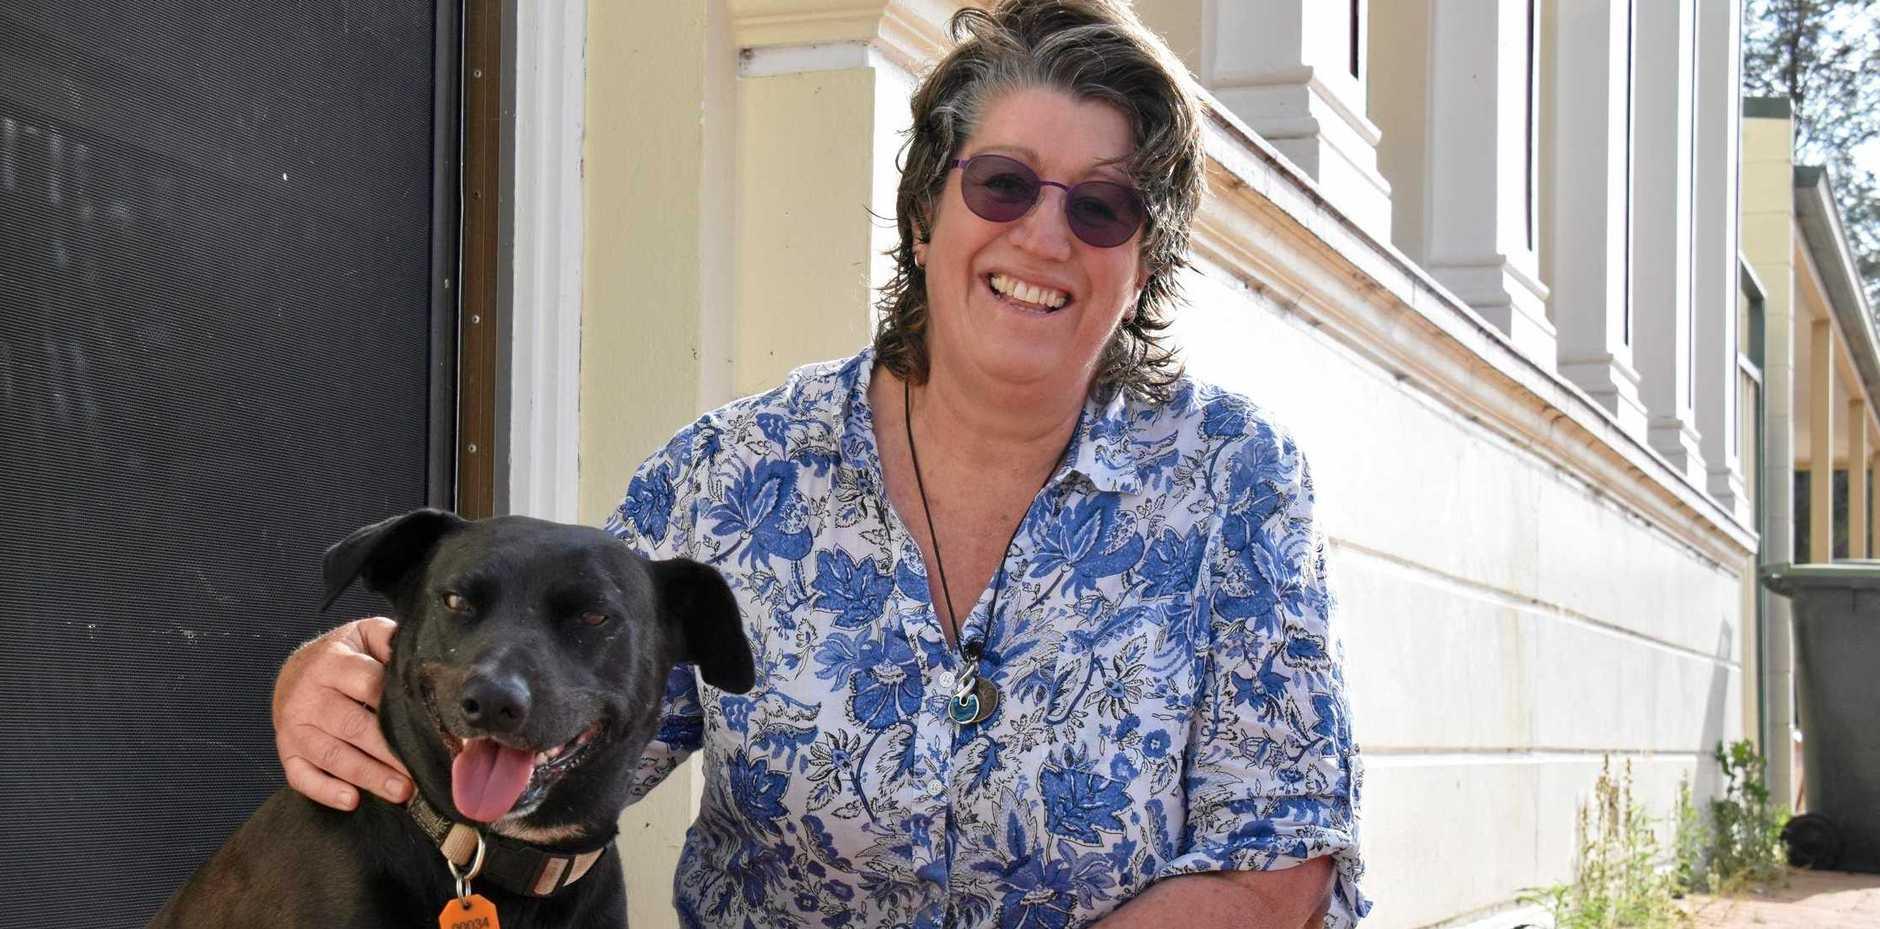 TOUGH ROAD: Single mum Lee McGregor with her dog, Darkie.